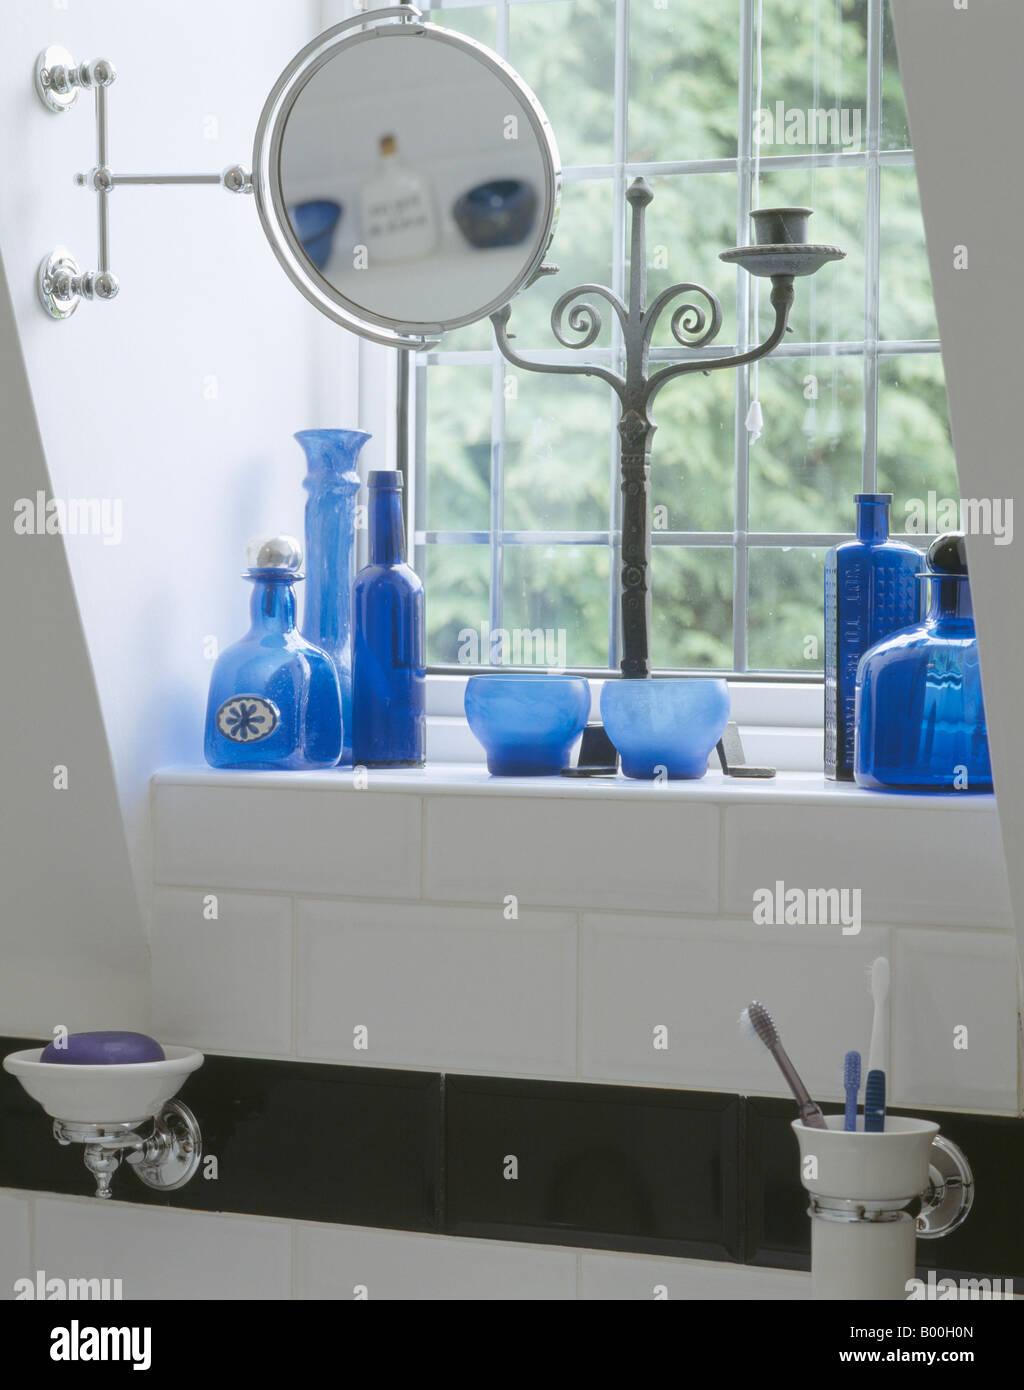 Bathroom With Circular Window Stock Photos & Bathroom With Circular ...